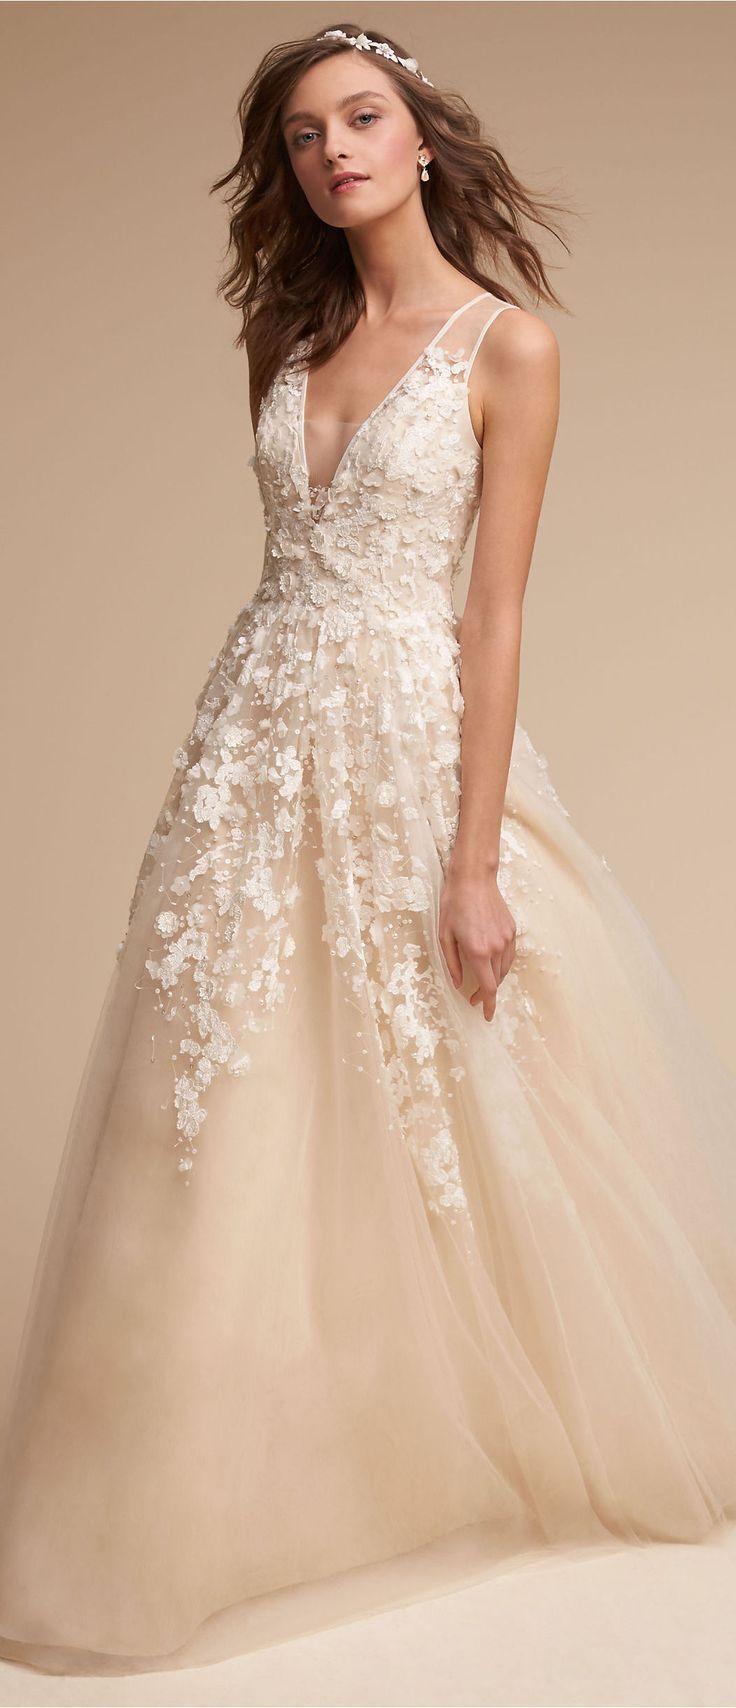 Wedding Dress by BHLDN | Weapons | Pinterest | Vestidos alta costura ...